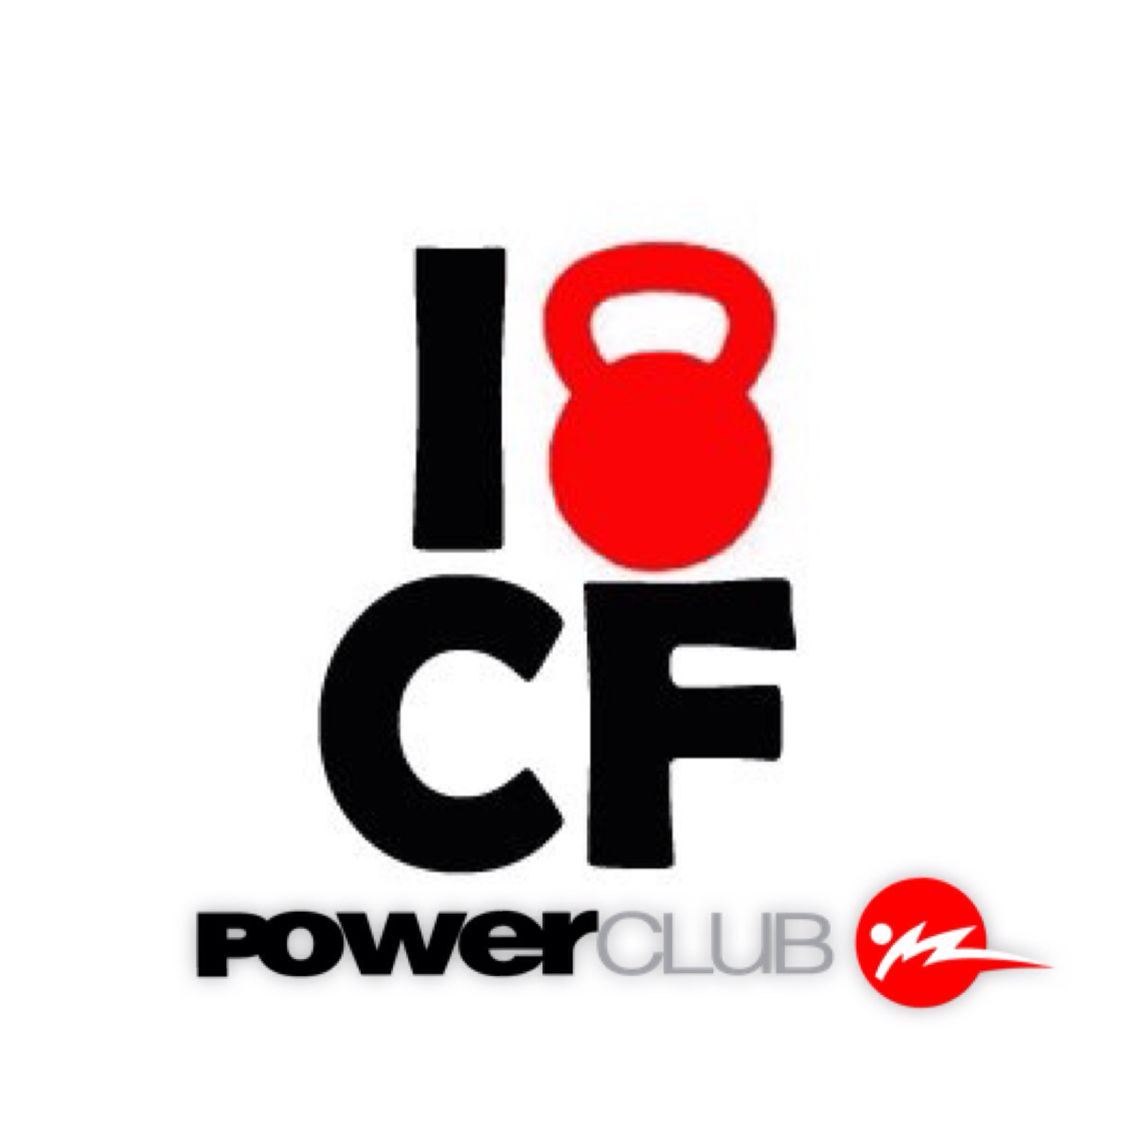 Miércoles de WOD @powerclubpanama #PowerFit #CualEsTuExcusa #Training #LoveCrossFit